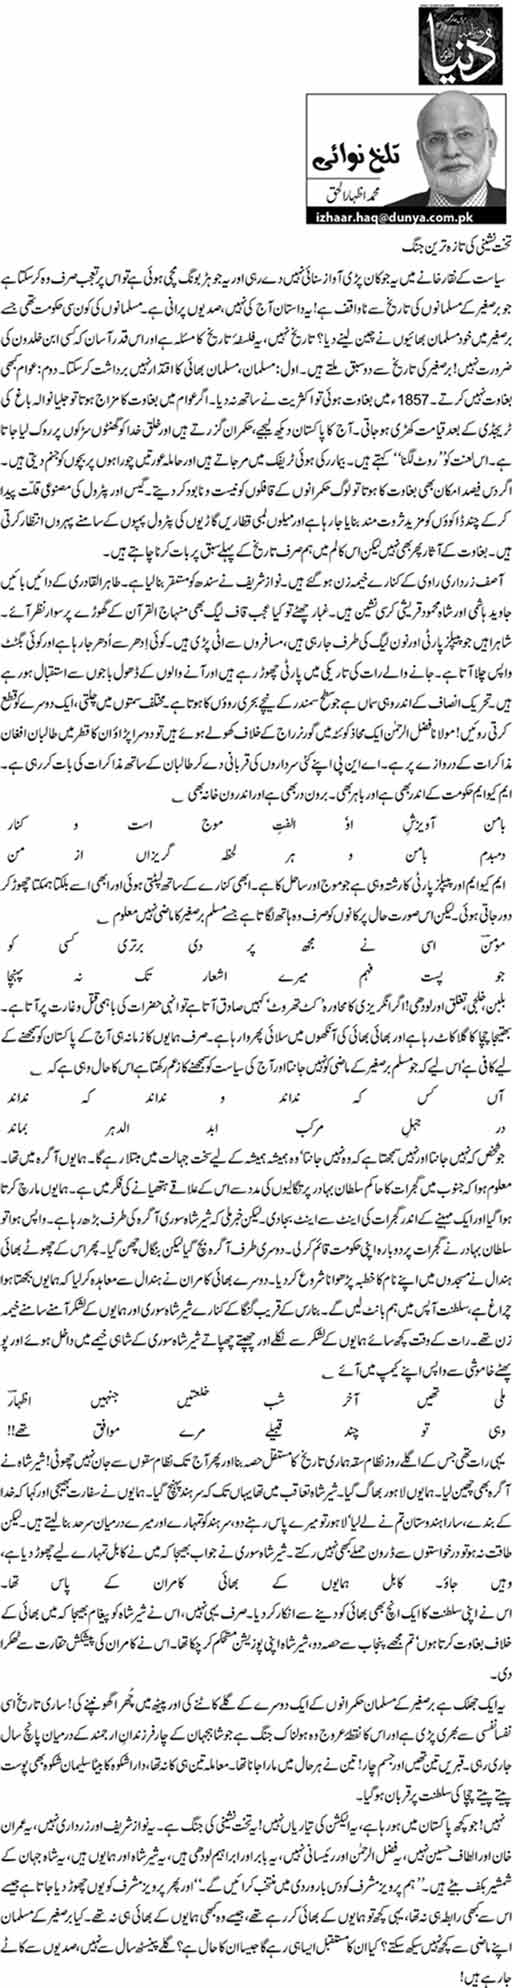 Takht nasheni ki taza tareen jang - M. Izhar ul Haq